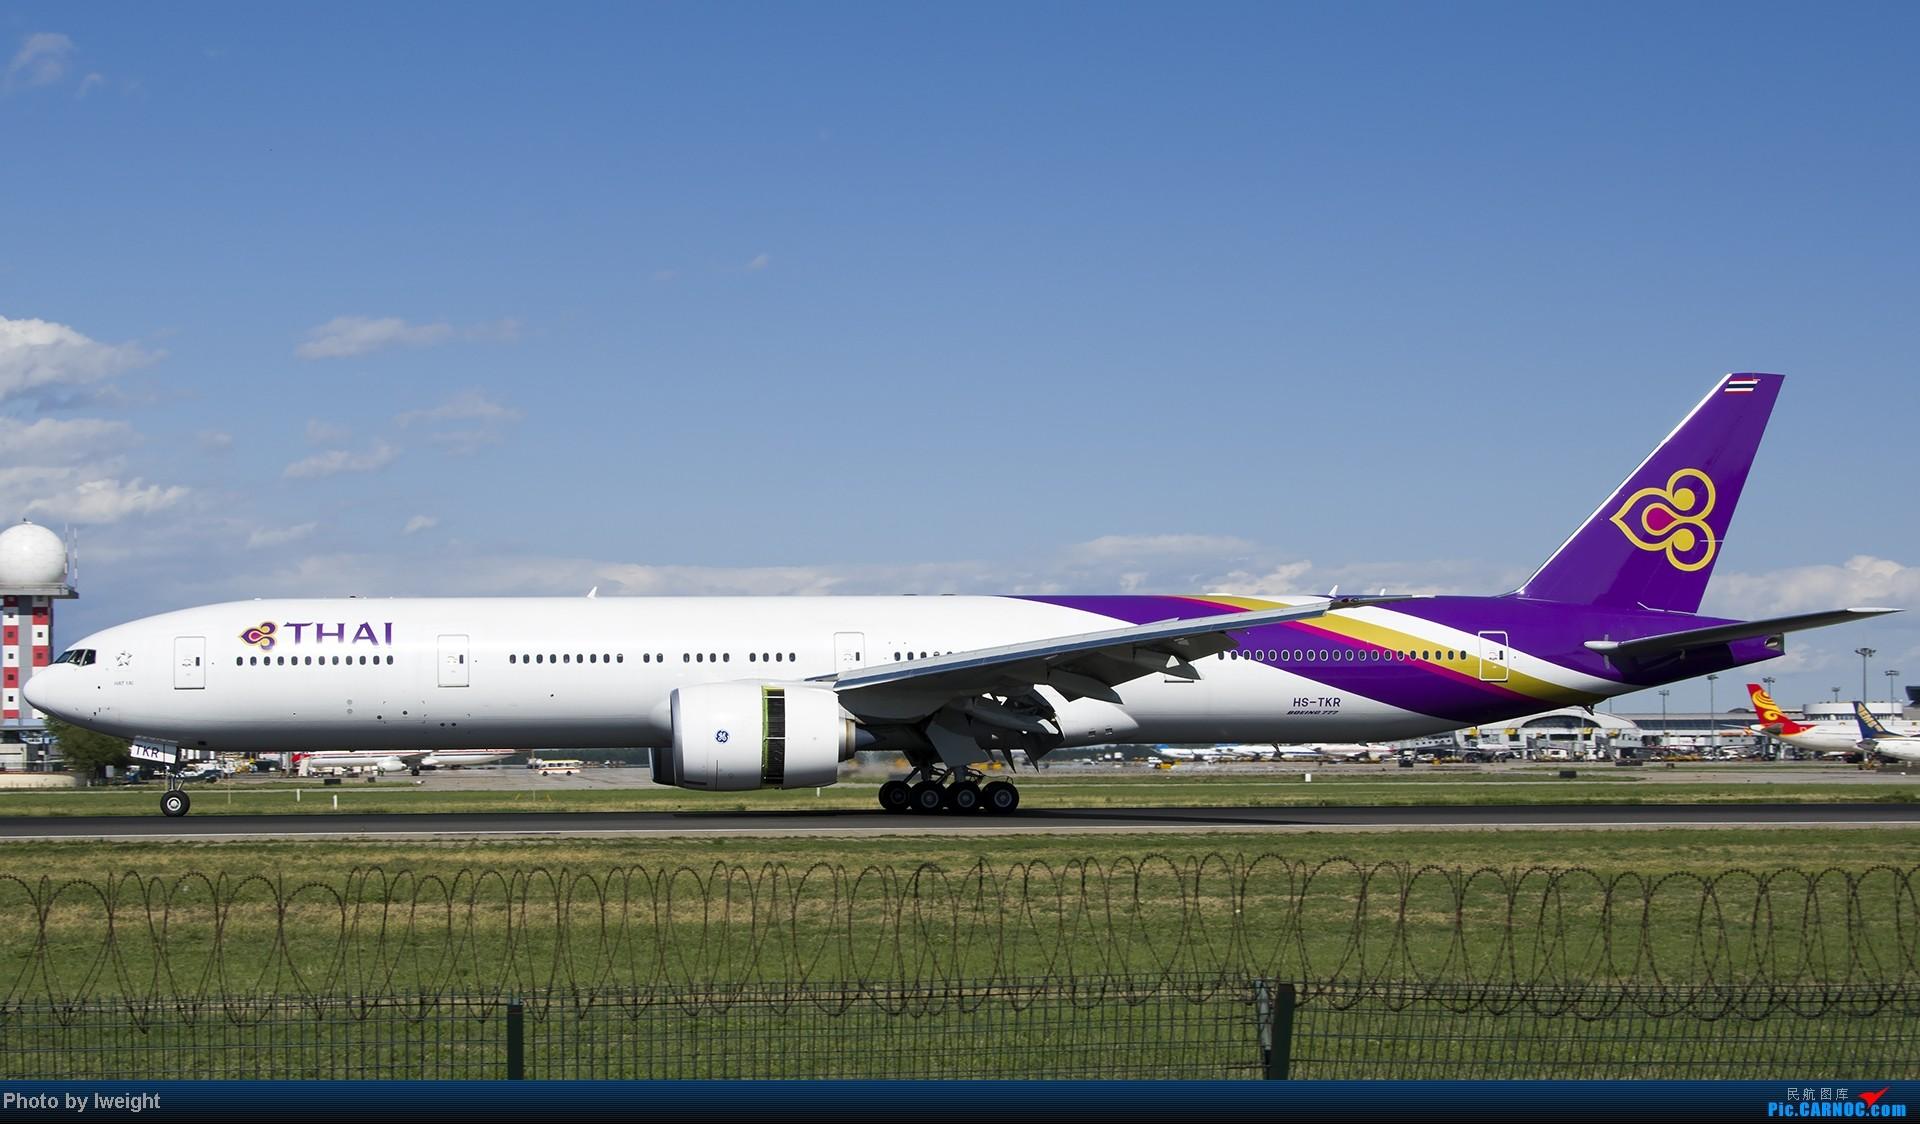 Re:[原创]新相机+好天气,PEK试机乱拍 BOEING 777-300ER HS-TKR 中国北京首都机场